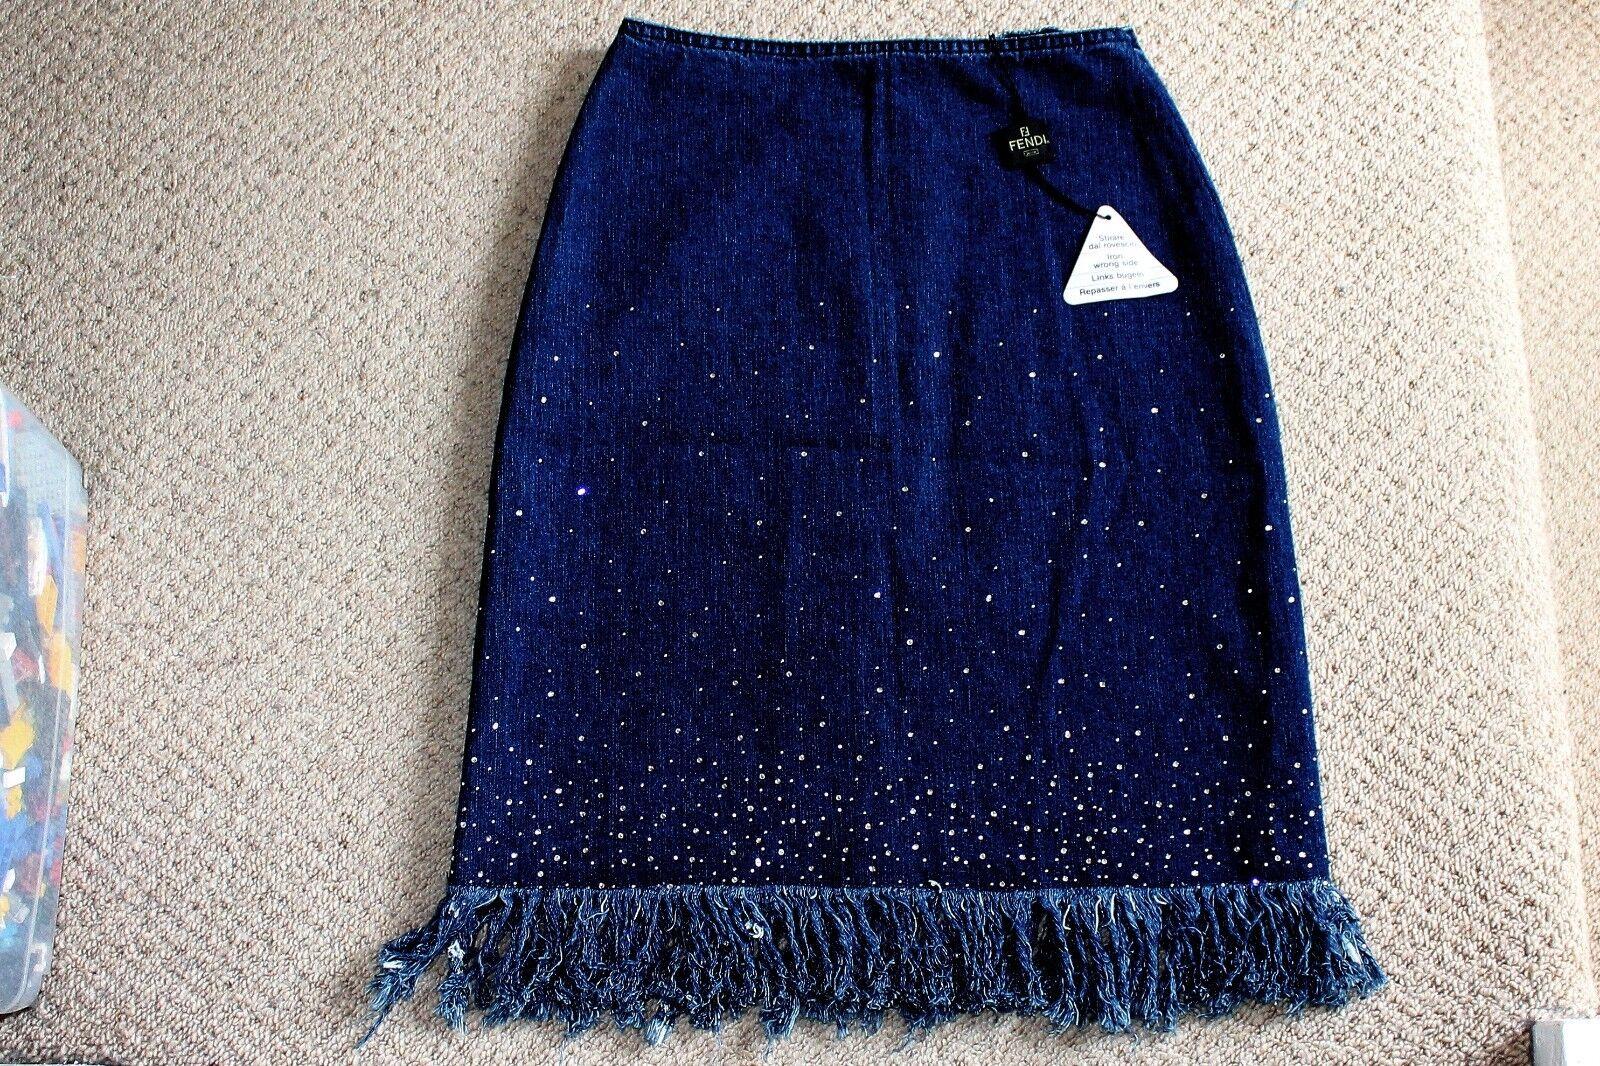 Genuine Fendi Denim Skirt - Brand New With Tag -  ovno